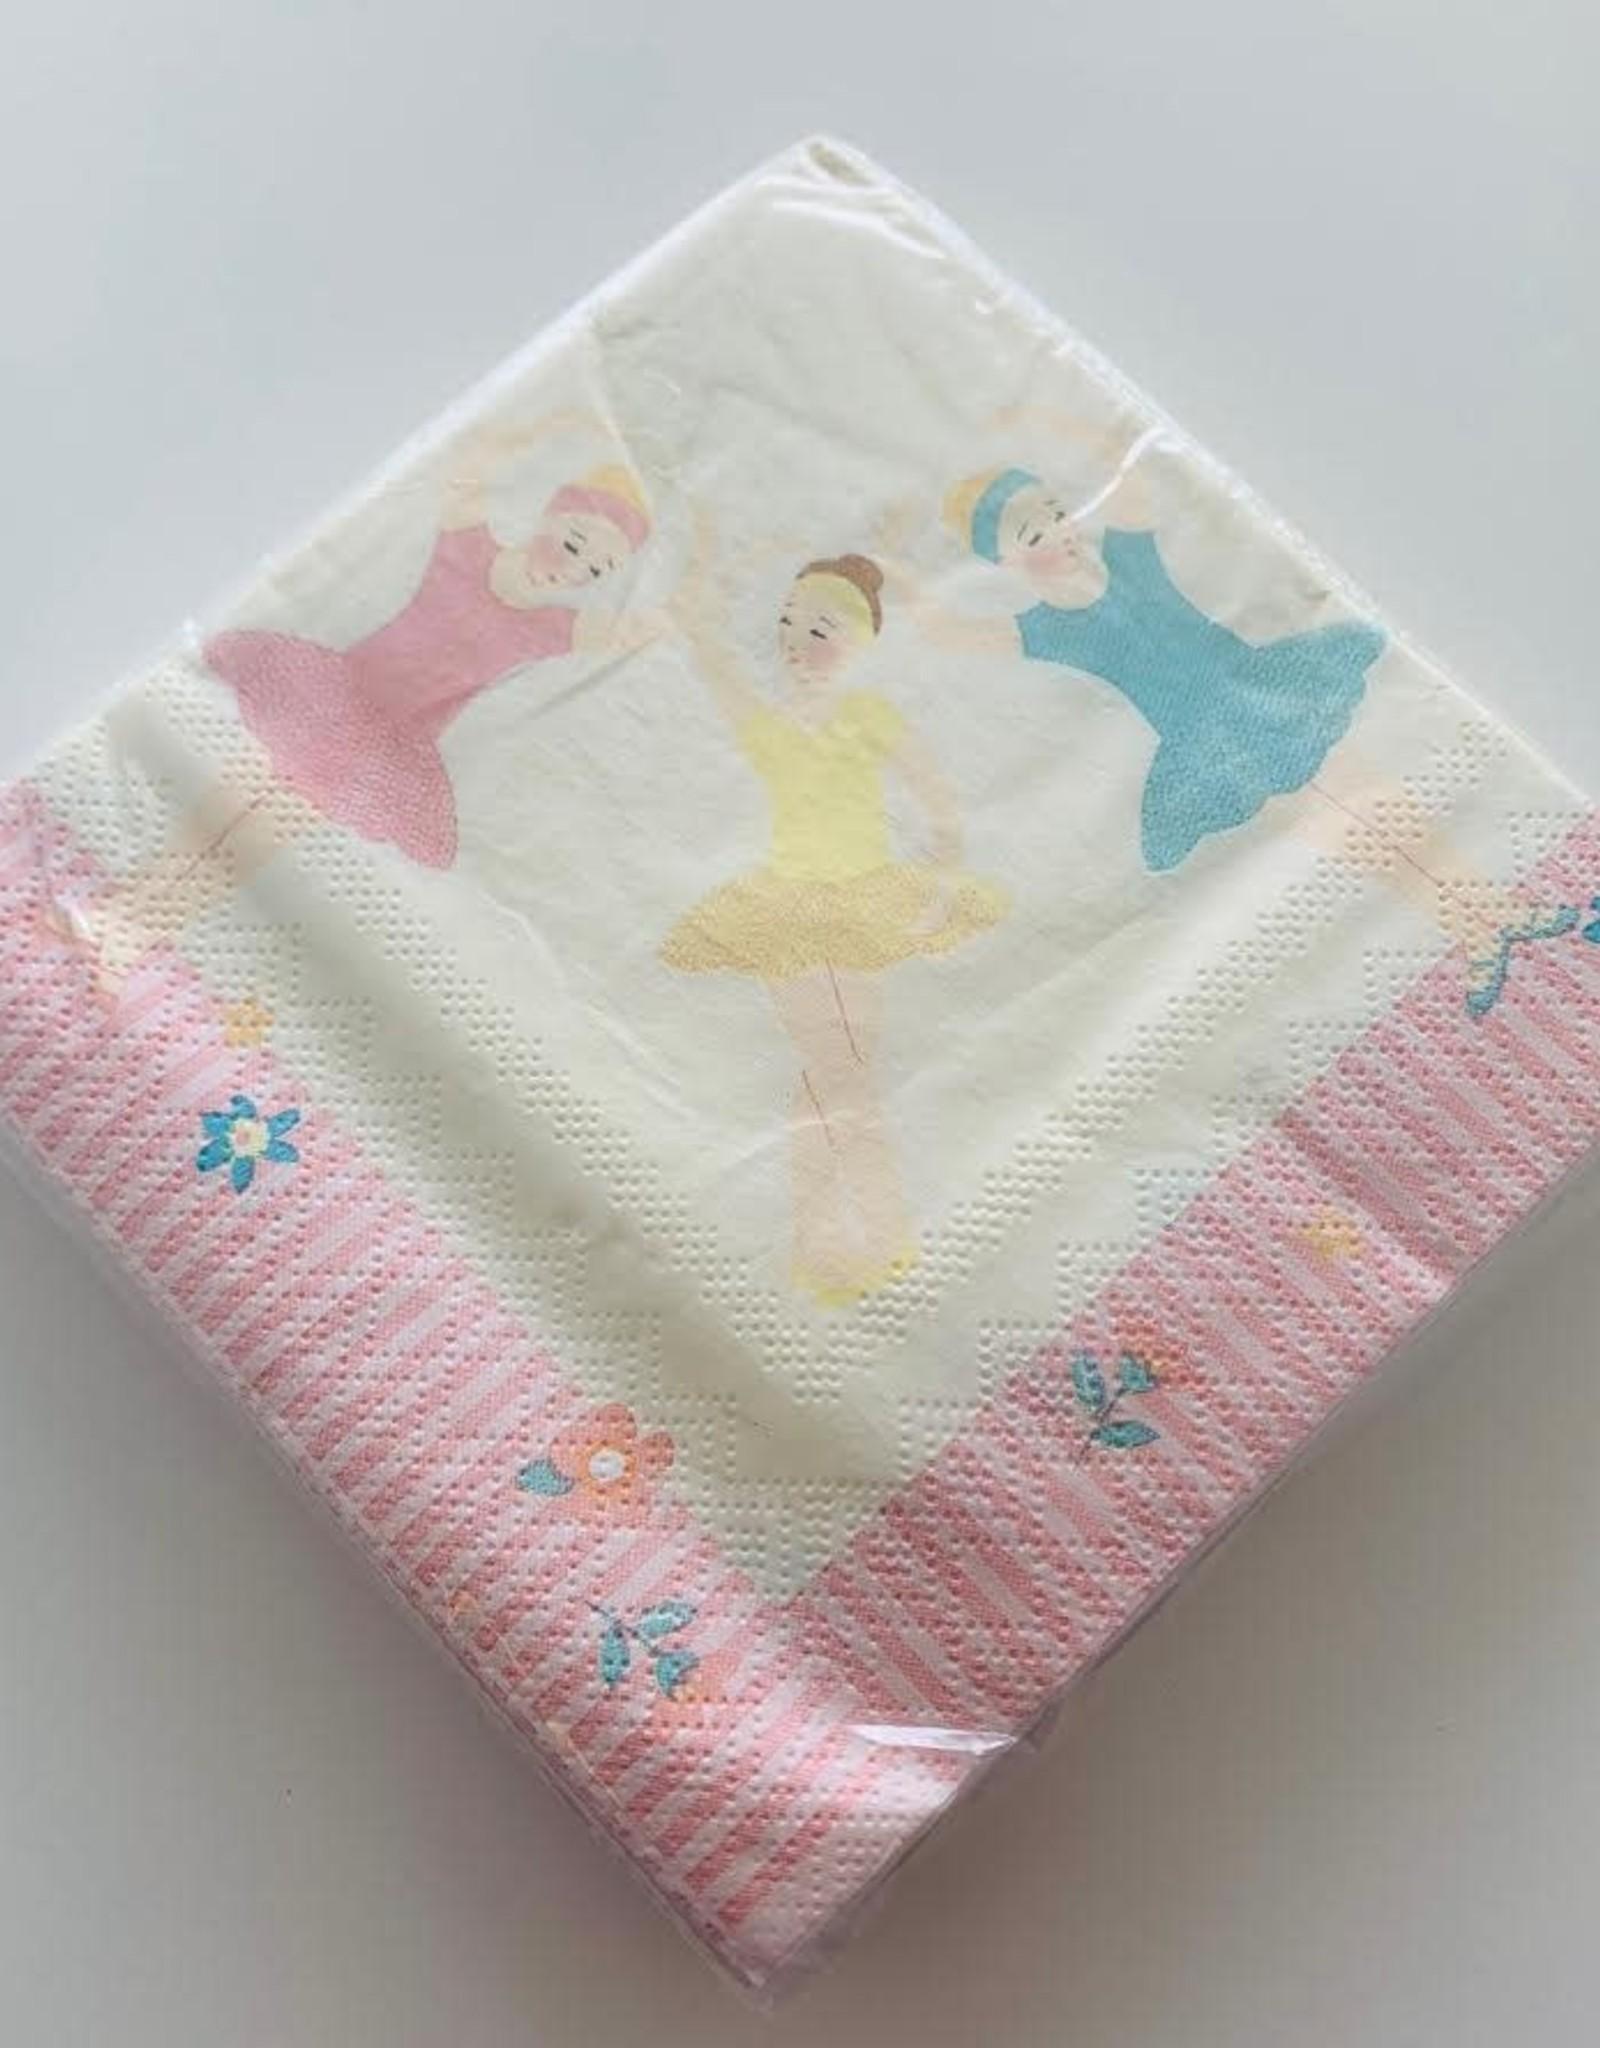 Meri Go Round Twinkle Toes Paper Napkins